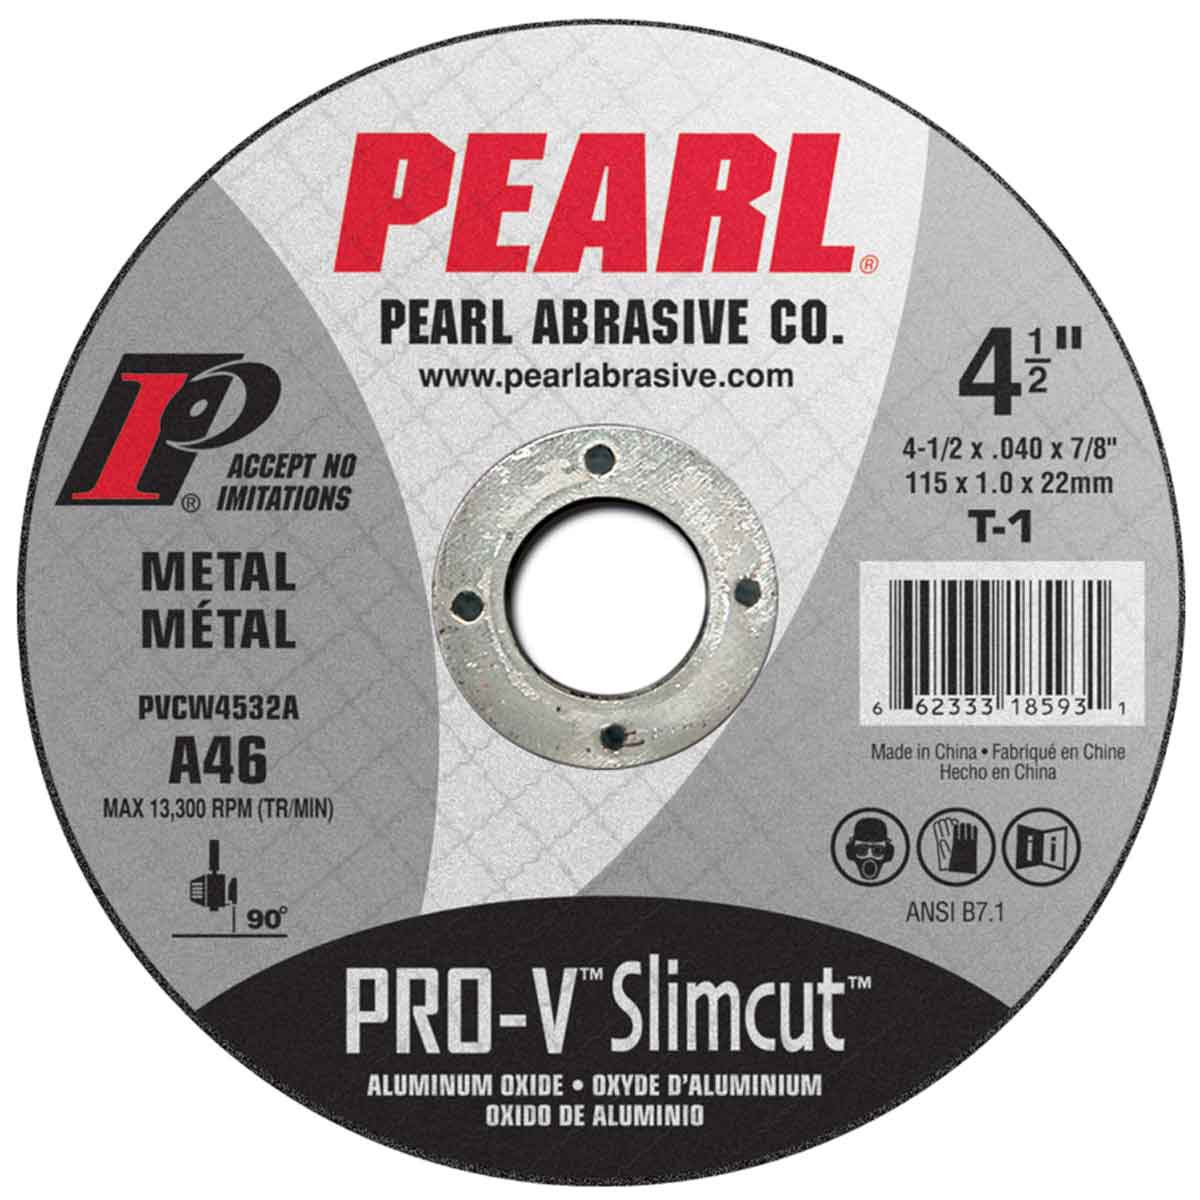 Pearl Abrasive 4-1/2 inch Slim Cut Pro V Aluminum Oxide Cut Off Wheel